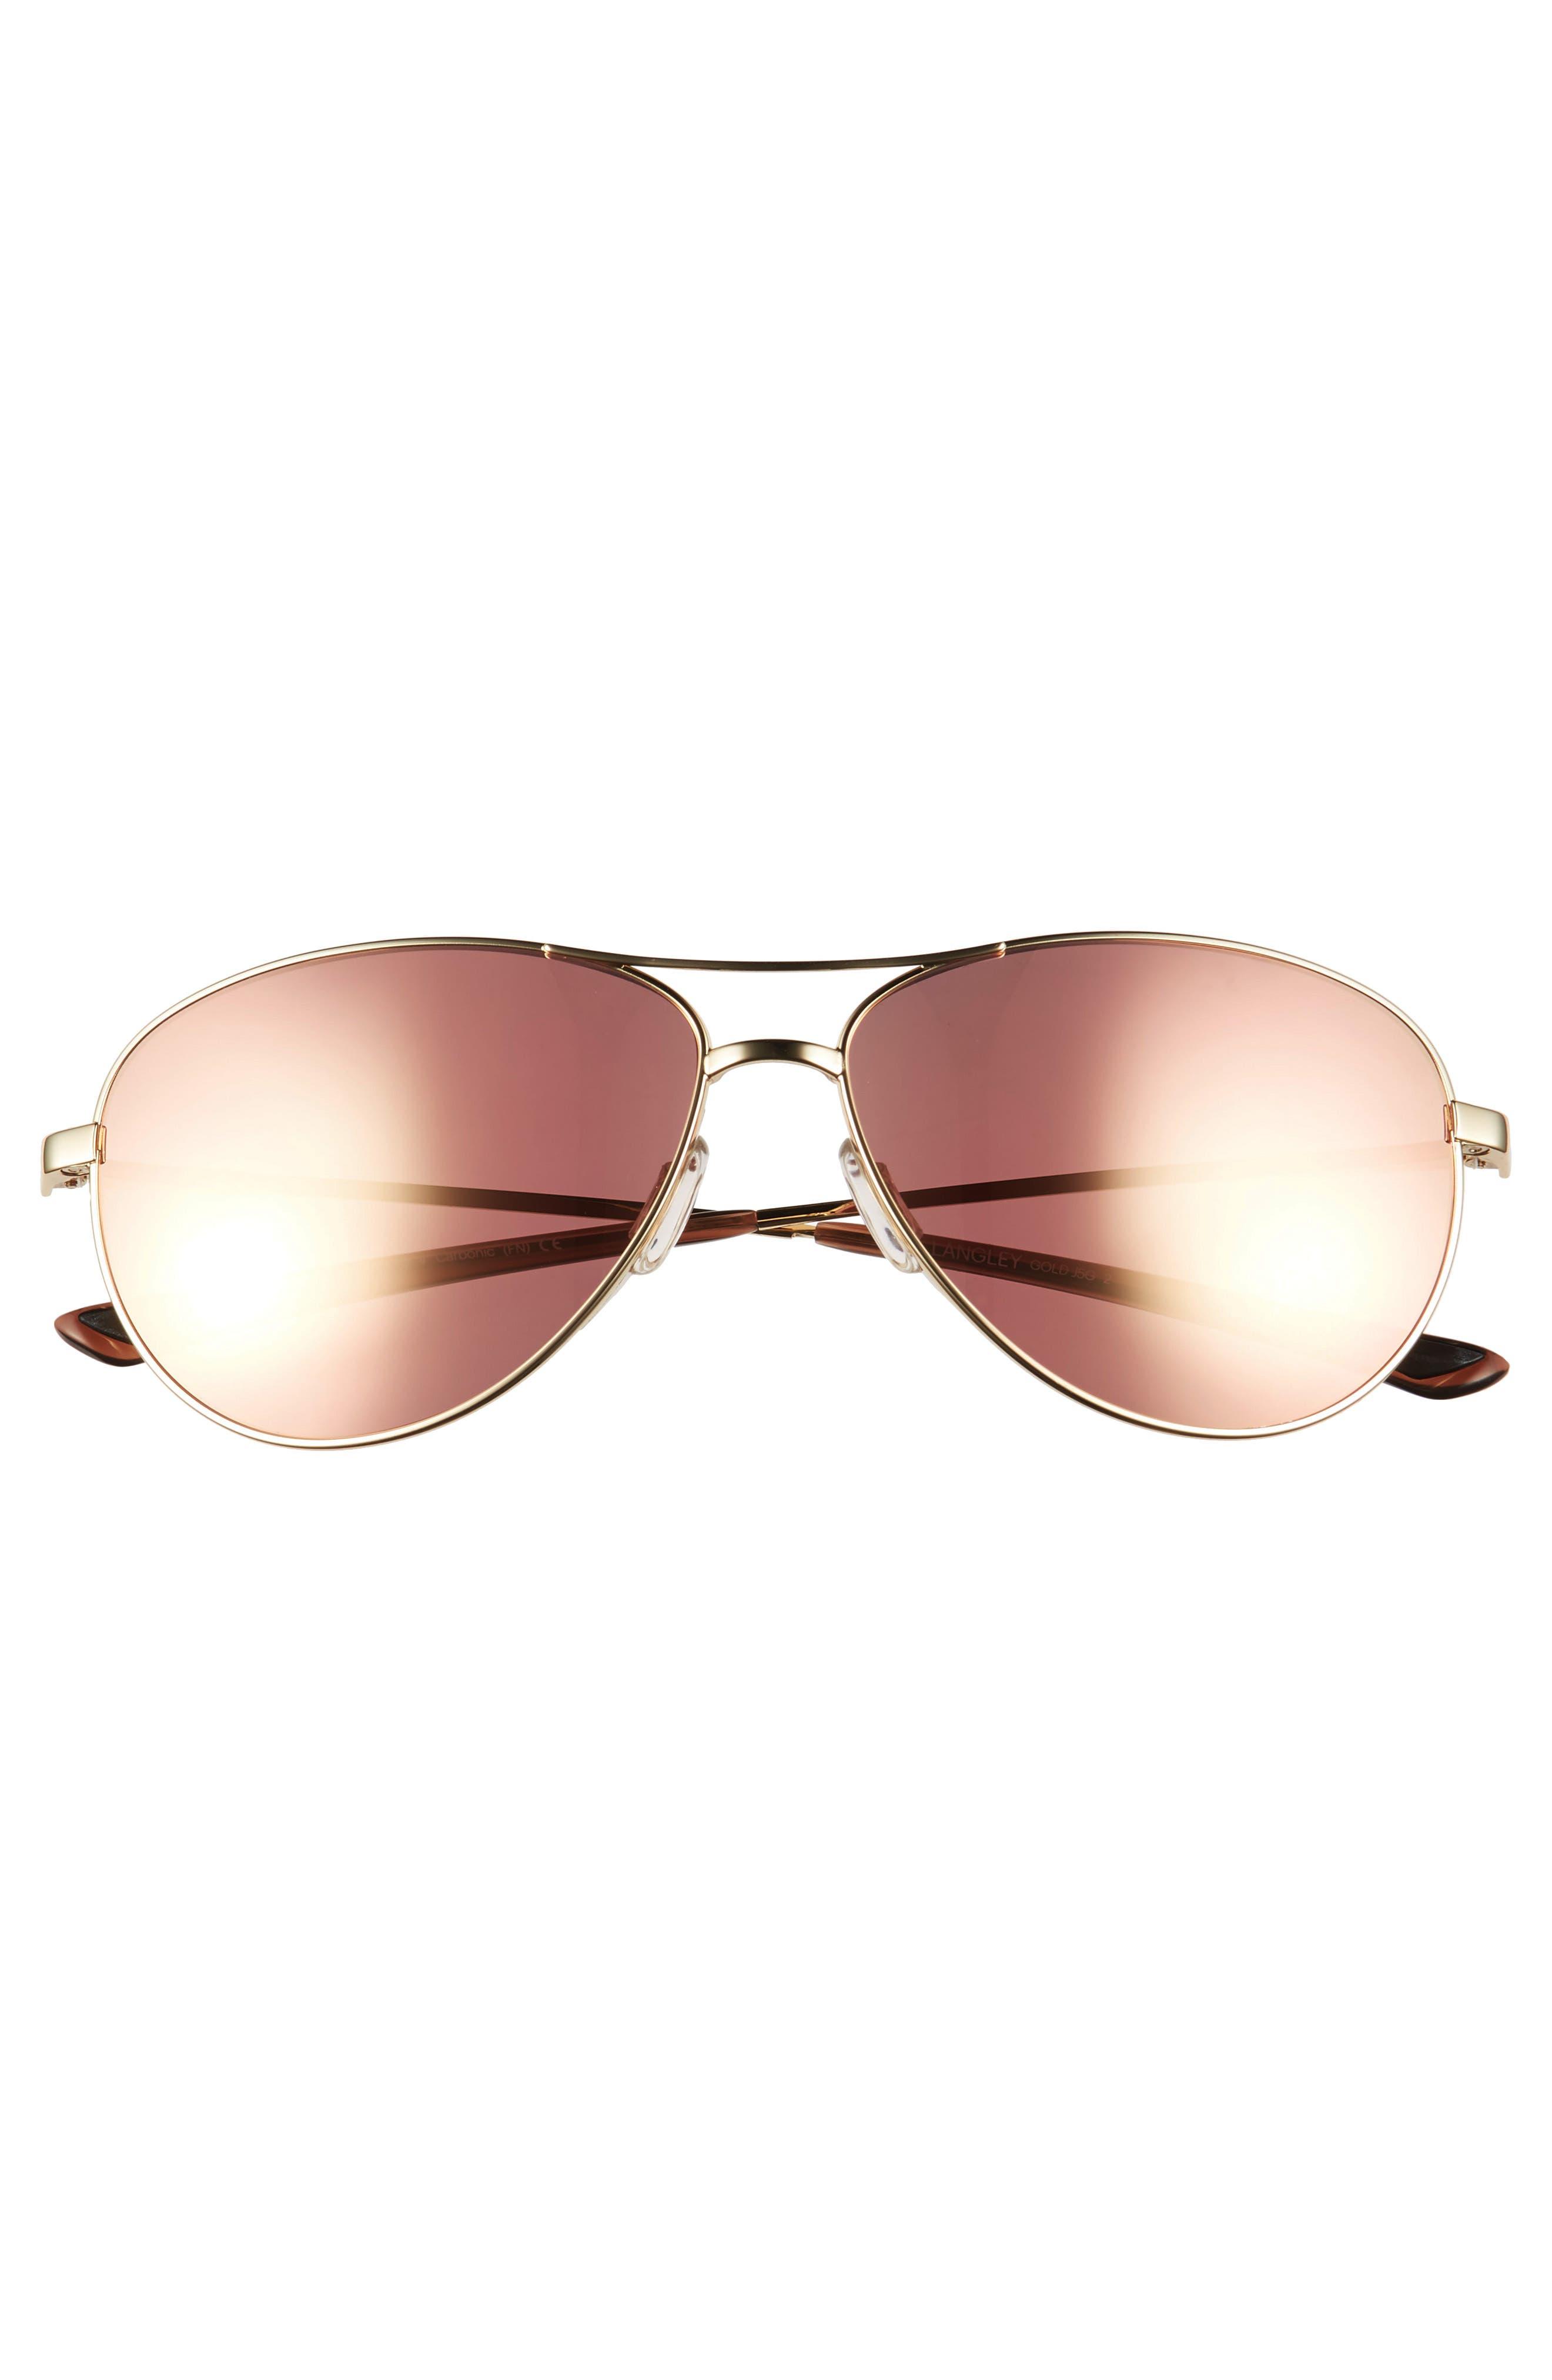 SMITH,                             'Langley' 60mm Aviator Sunglasses,                             Alternate thumbnail 3, color,                             GOLD